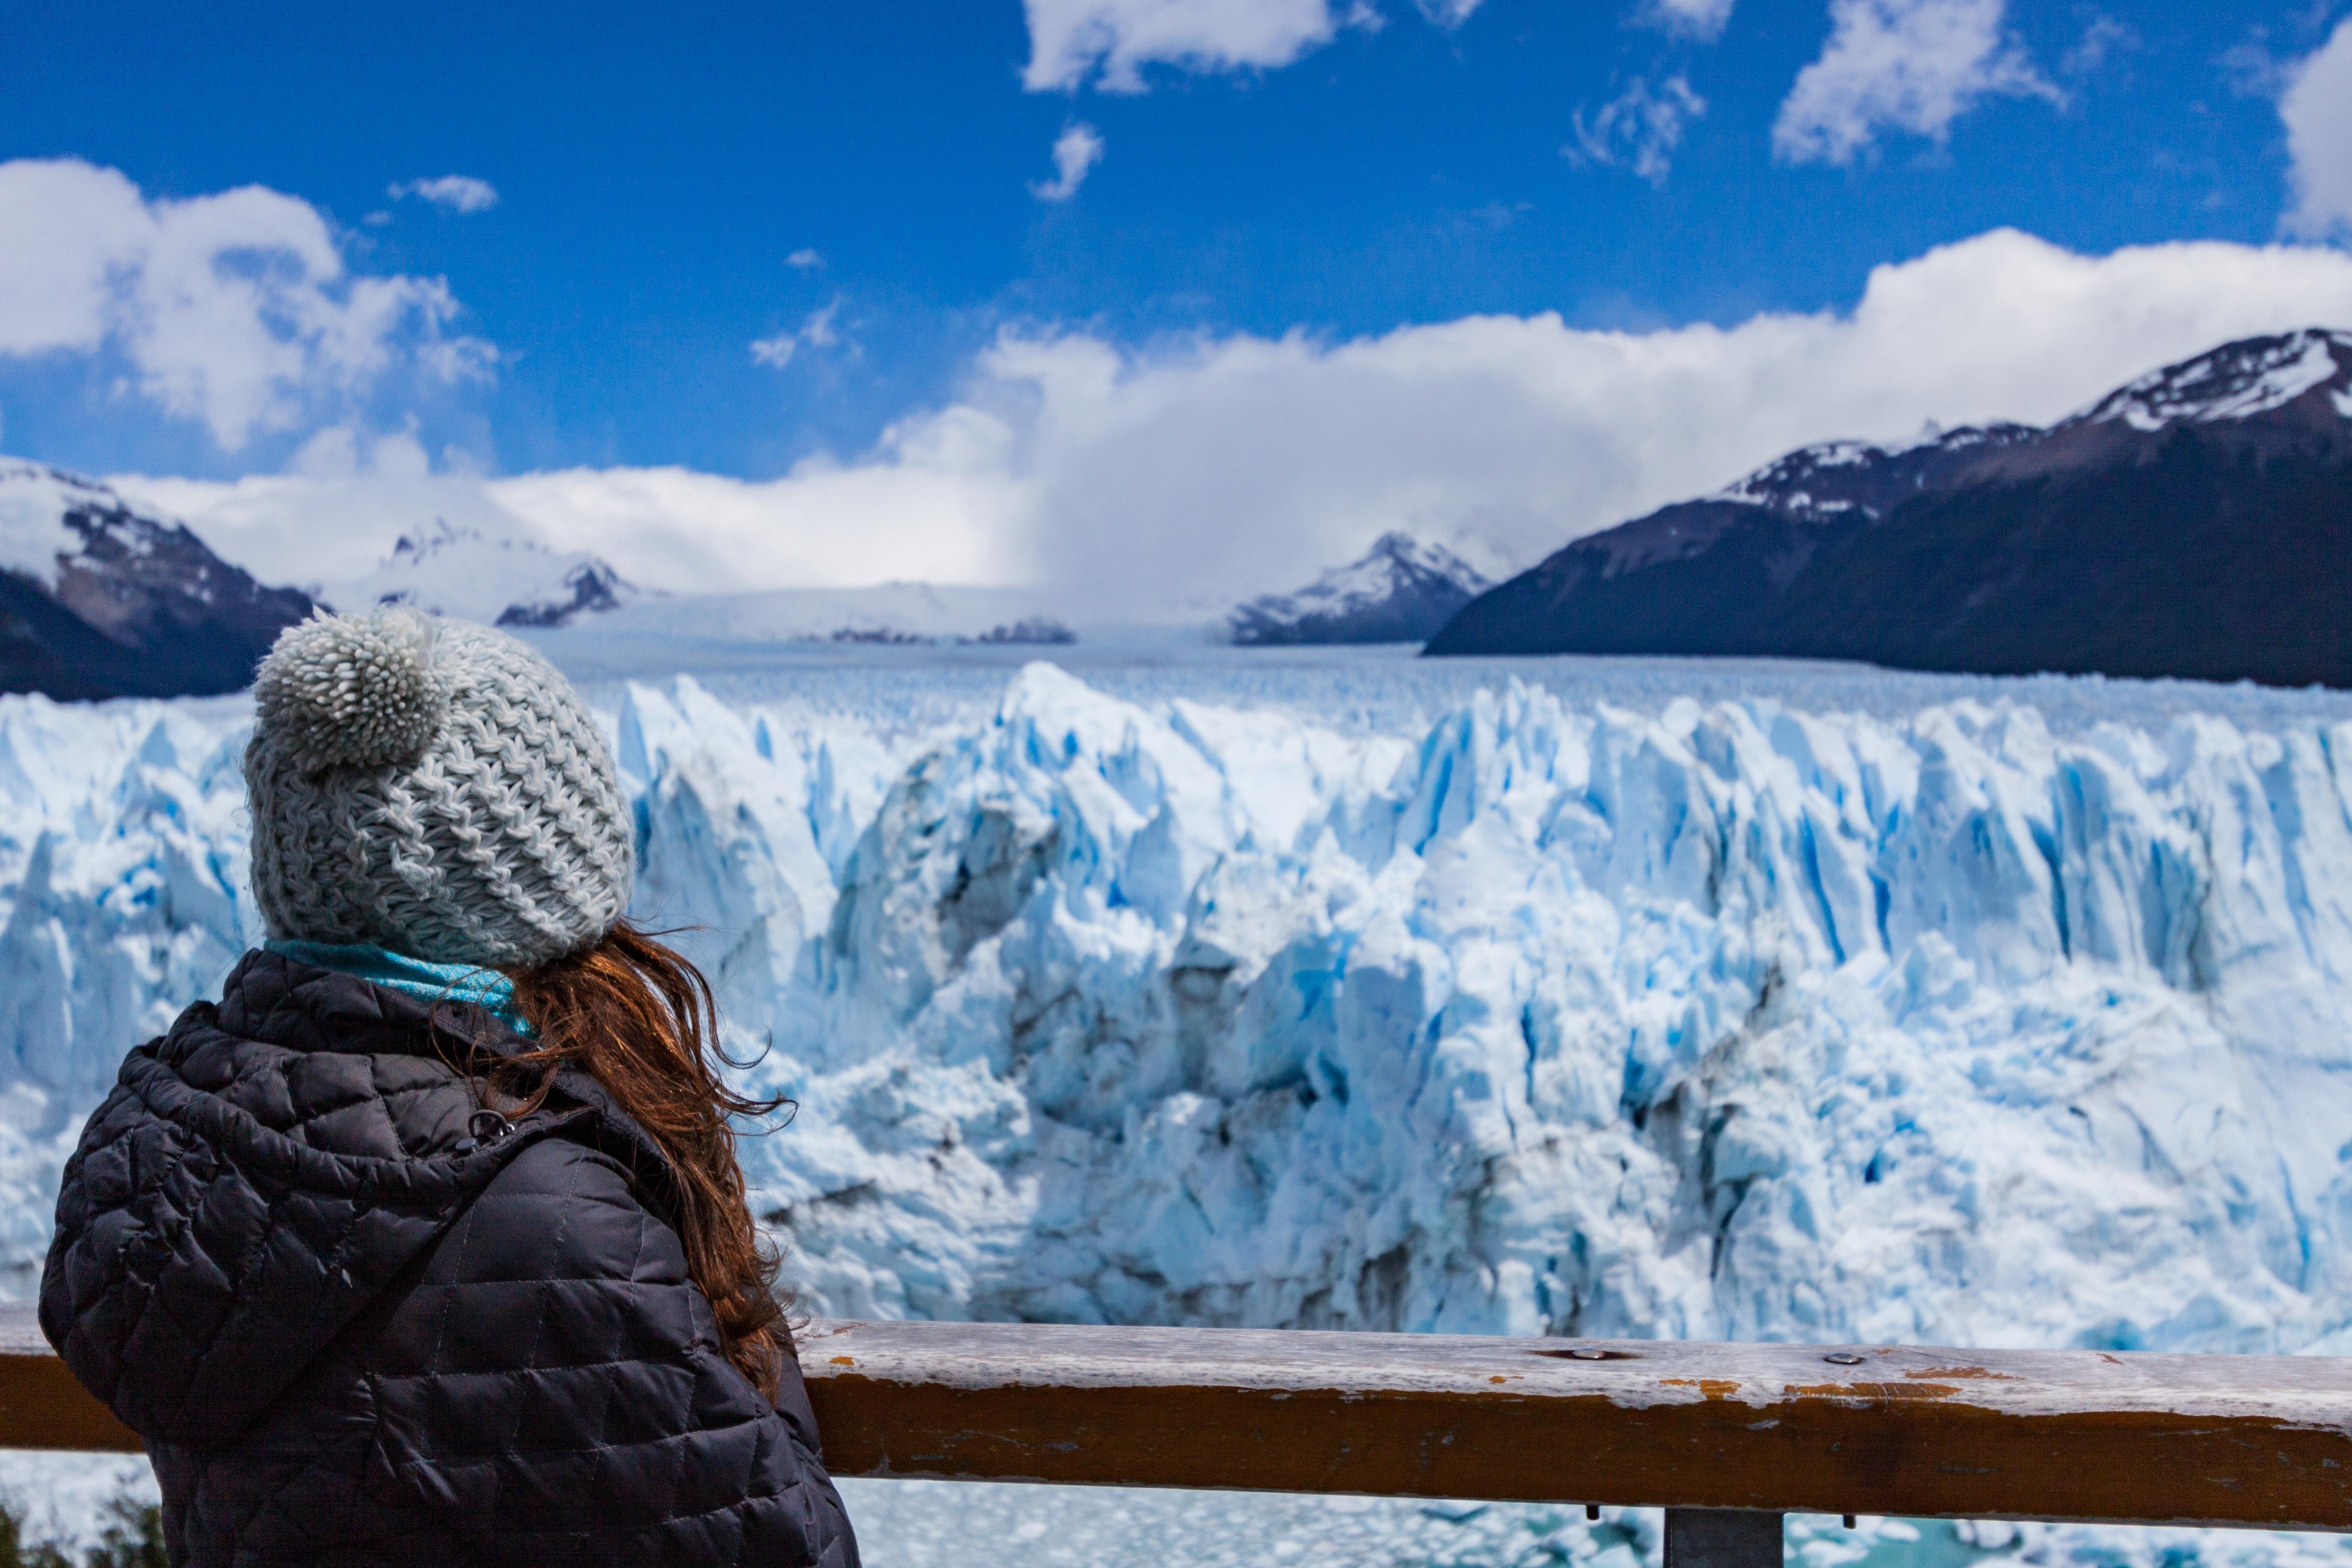 person wearing black hooded jacket seeing snow mountain during daytime